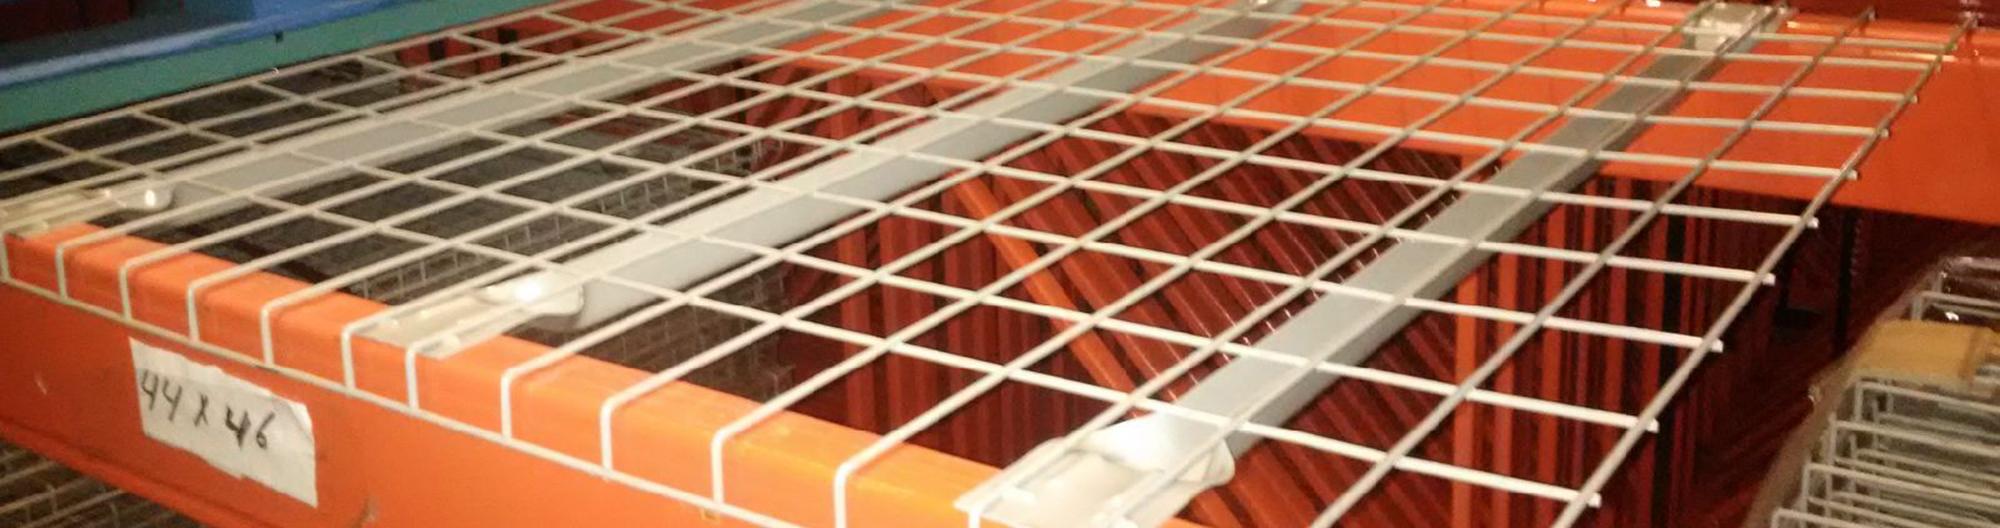 wire mesh decking over wood decking